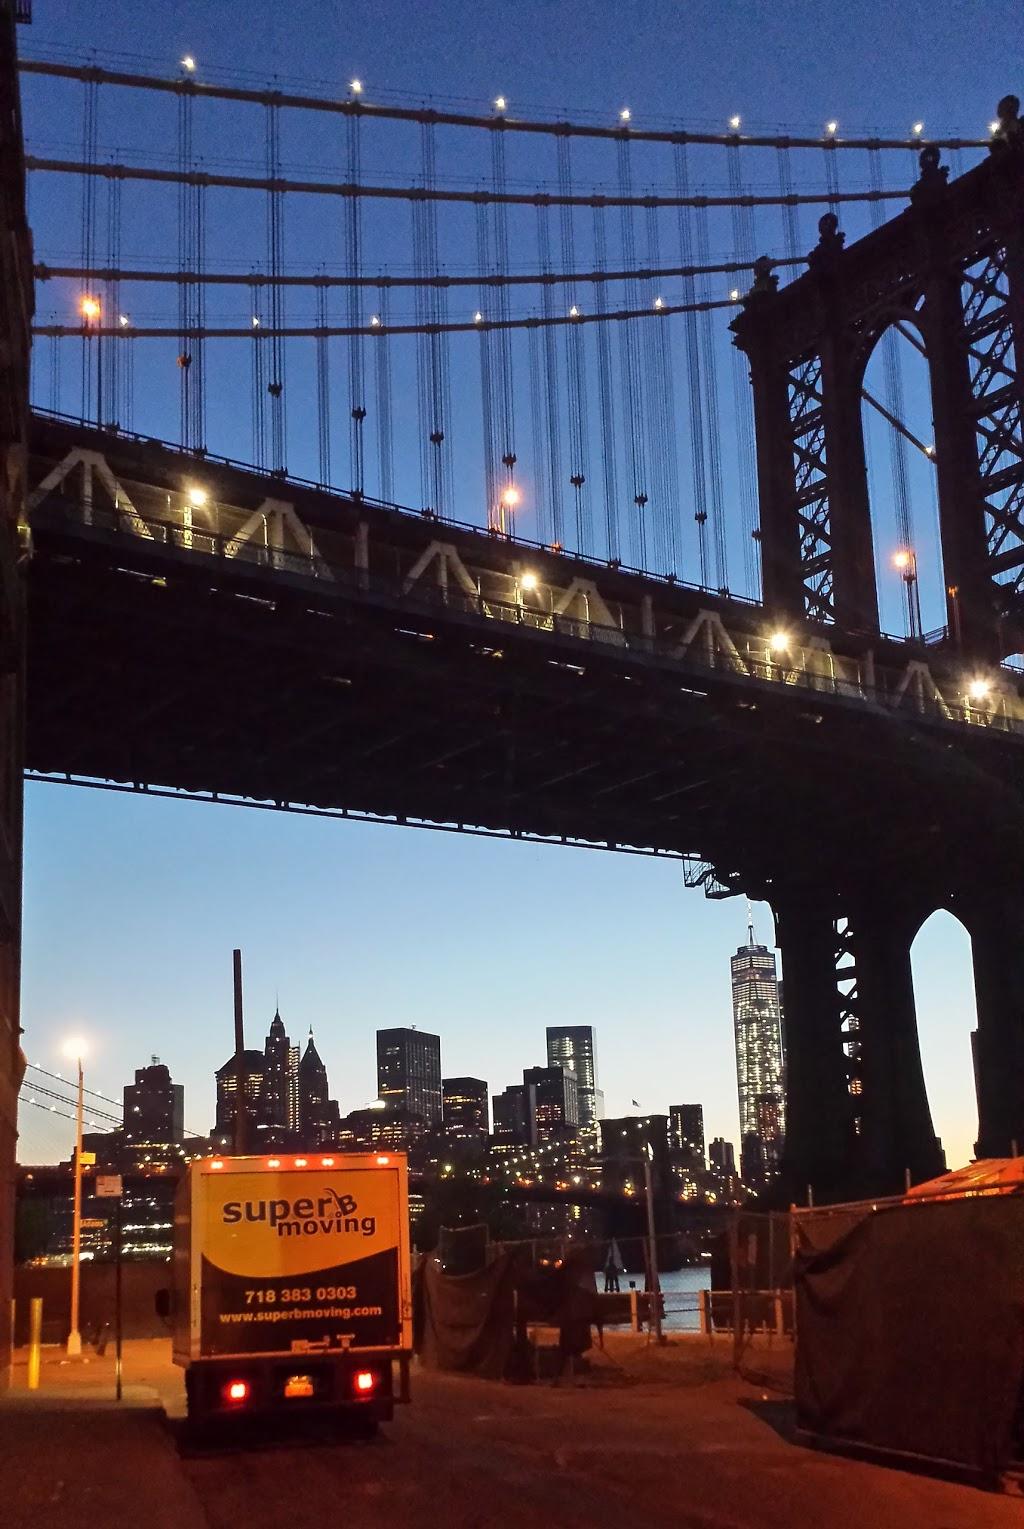 Superb Moving - moving company  | Photo 8 of 10 | Address: 460 Kingsland Ave #199, Brooklyn, NY 11222, USA | Phone: (718) 383-0303